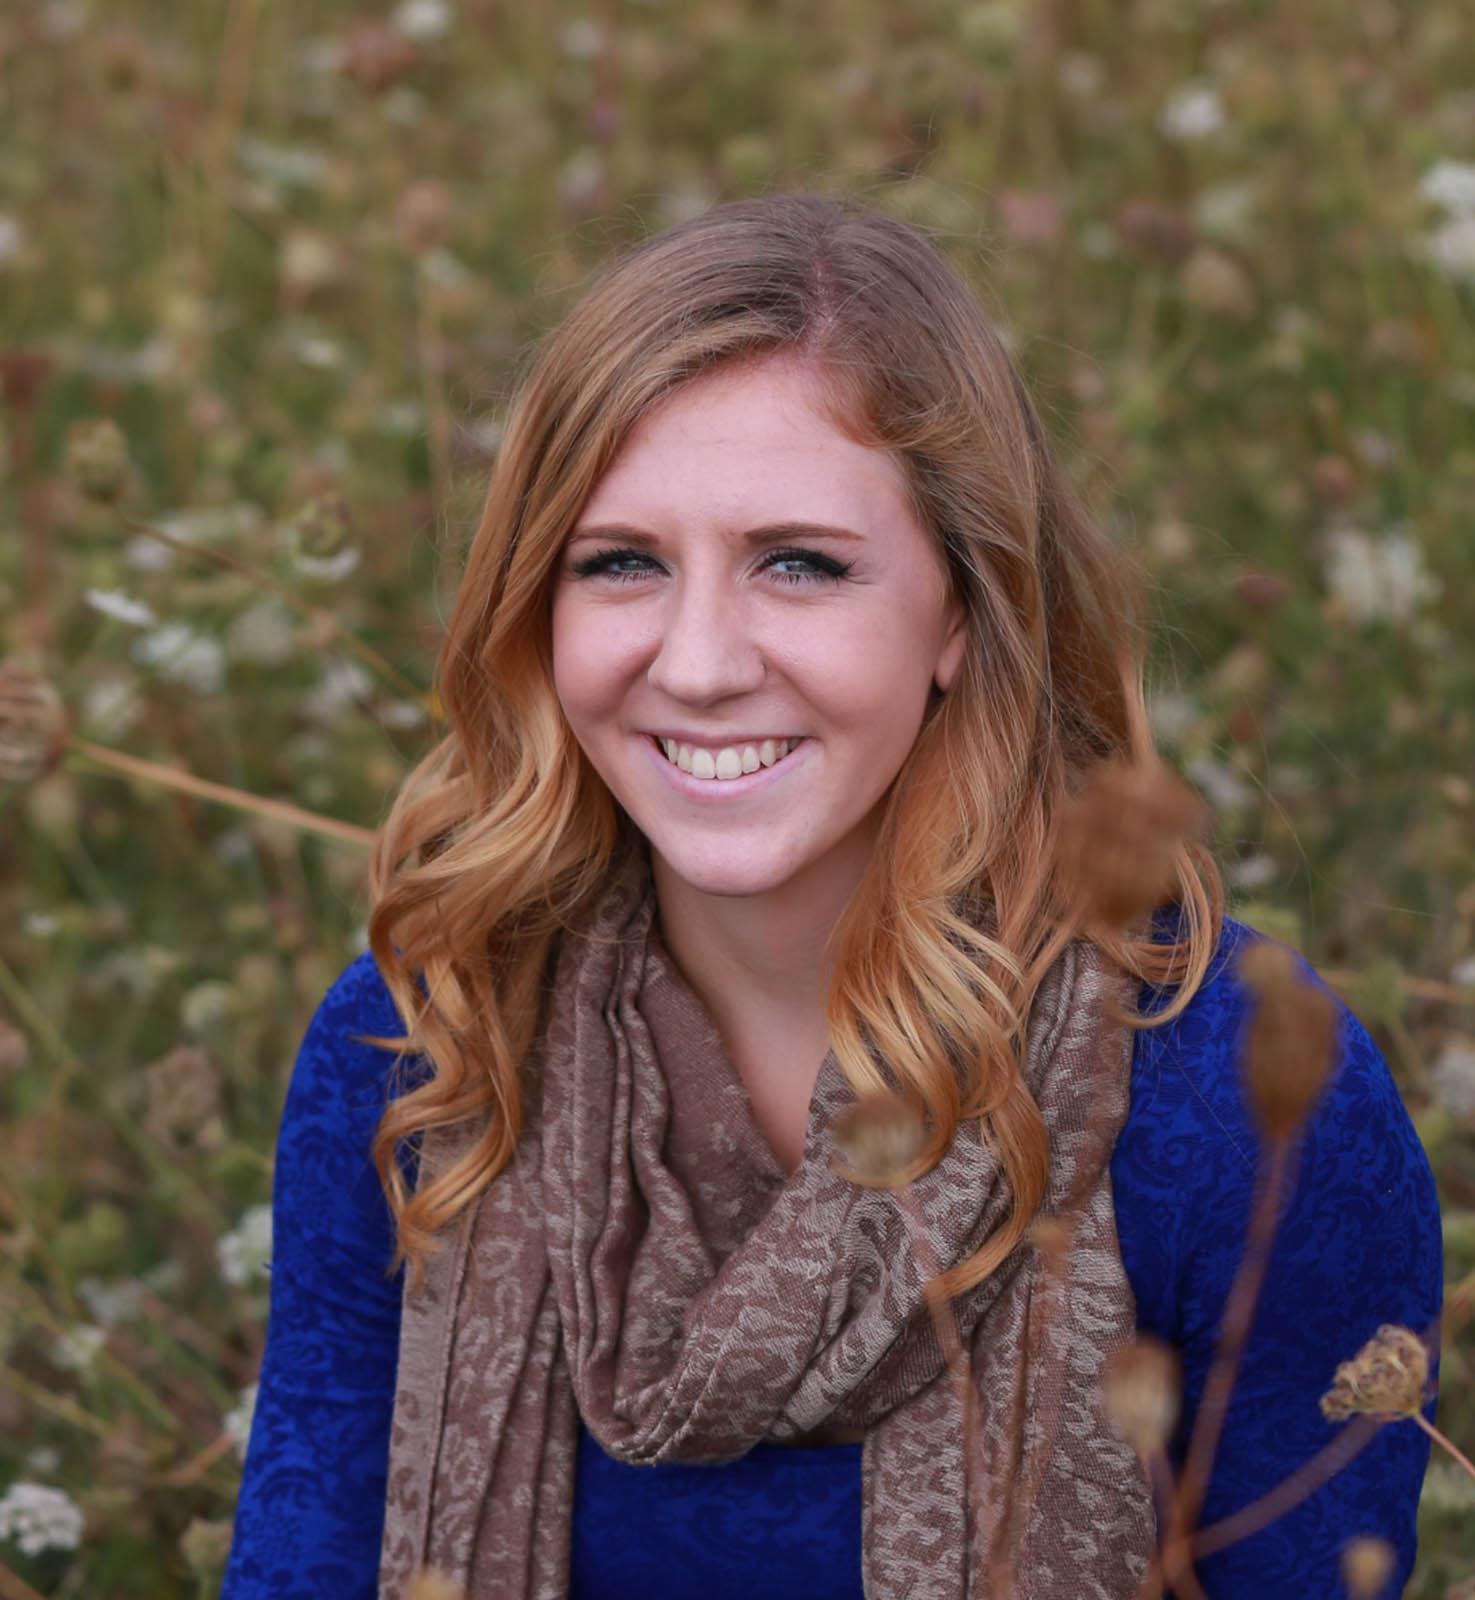 senior portrait female long blonde hair blue dress sitting in field